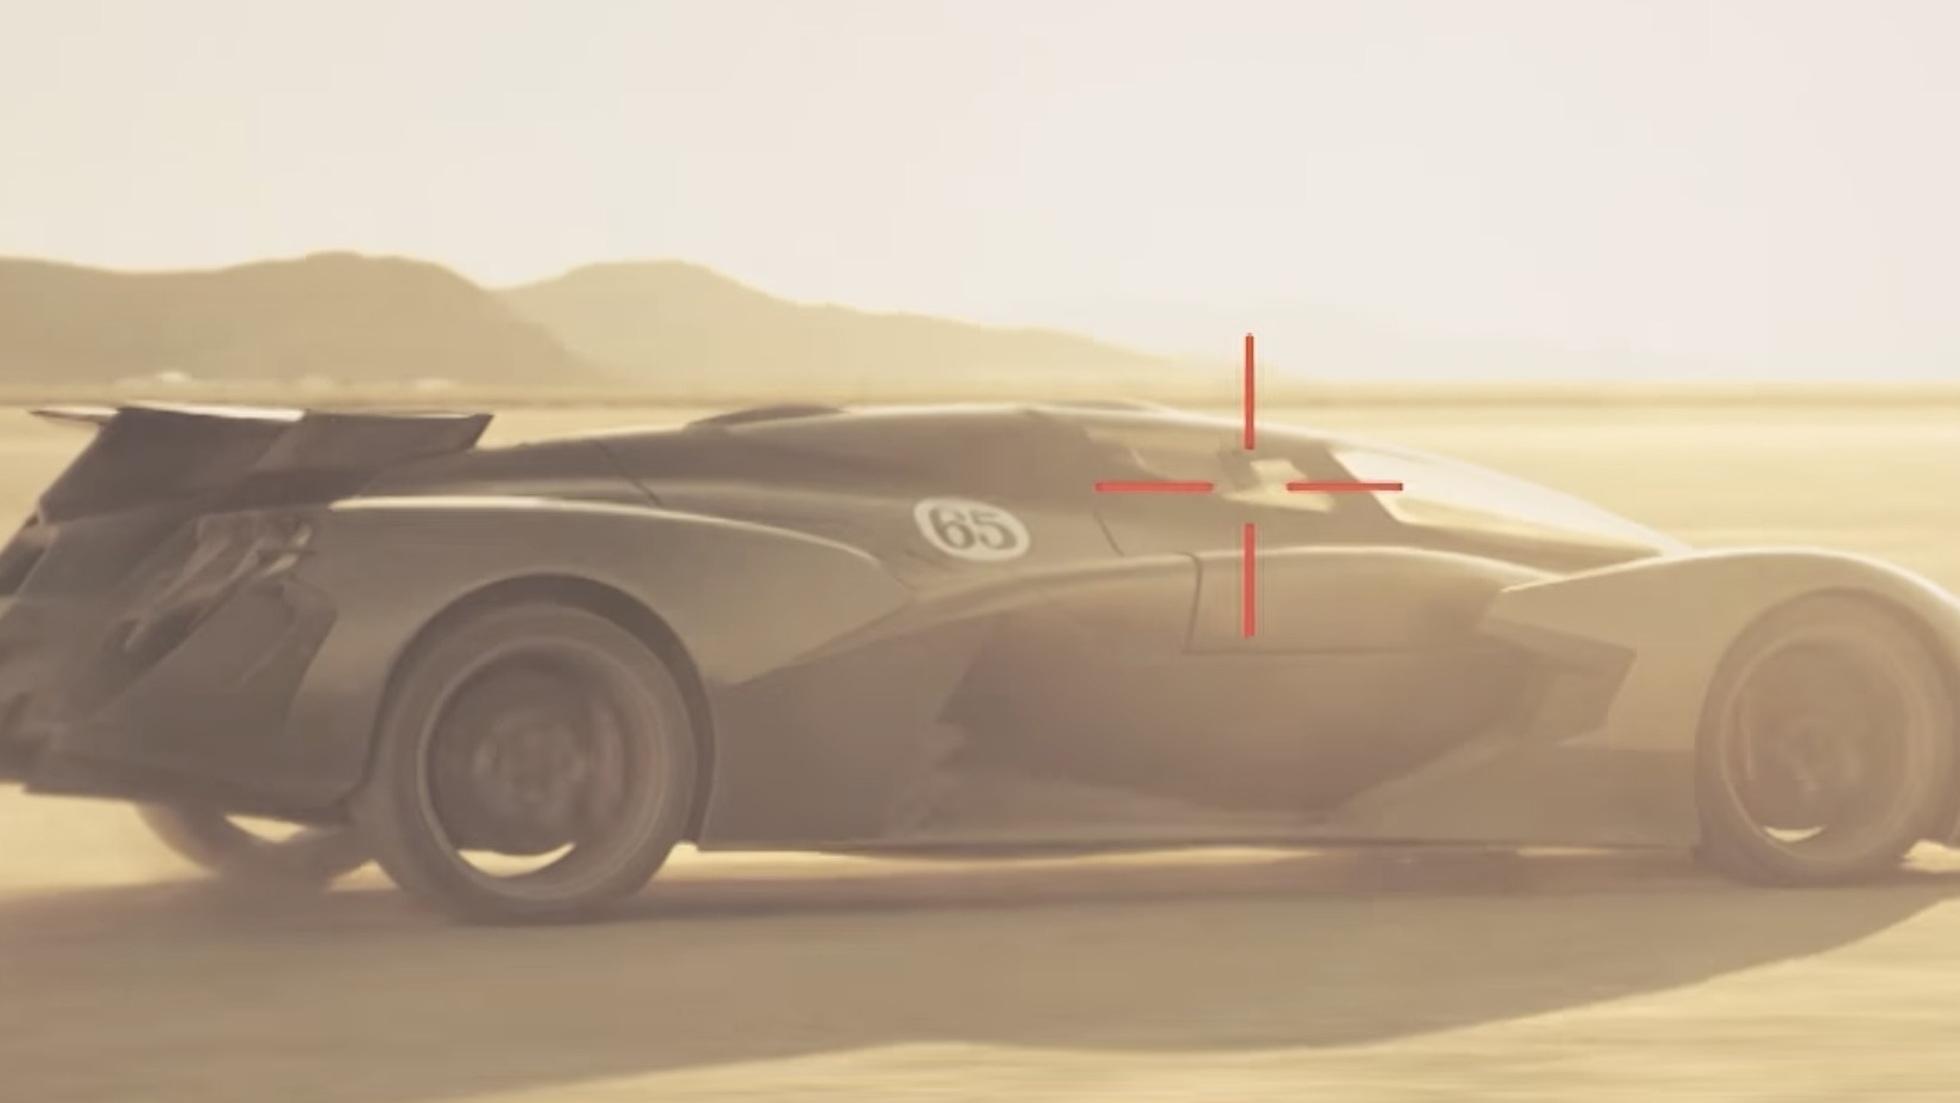 Tachyon Speed all-electric hypercar